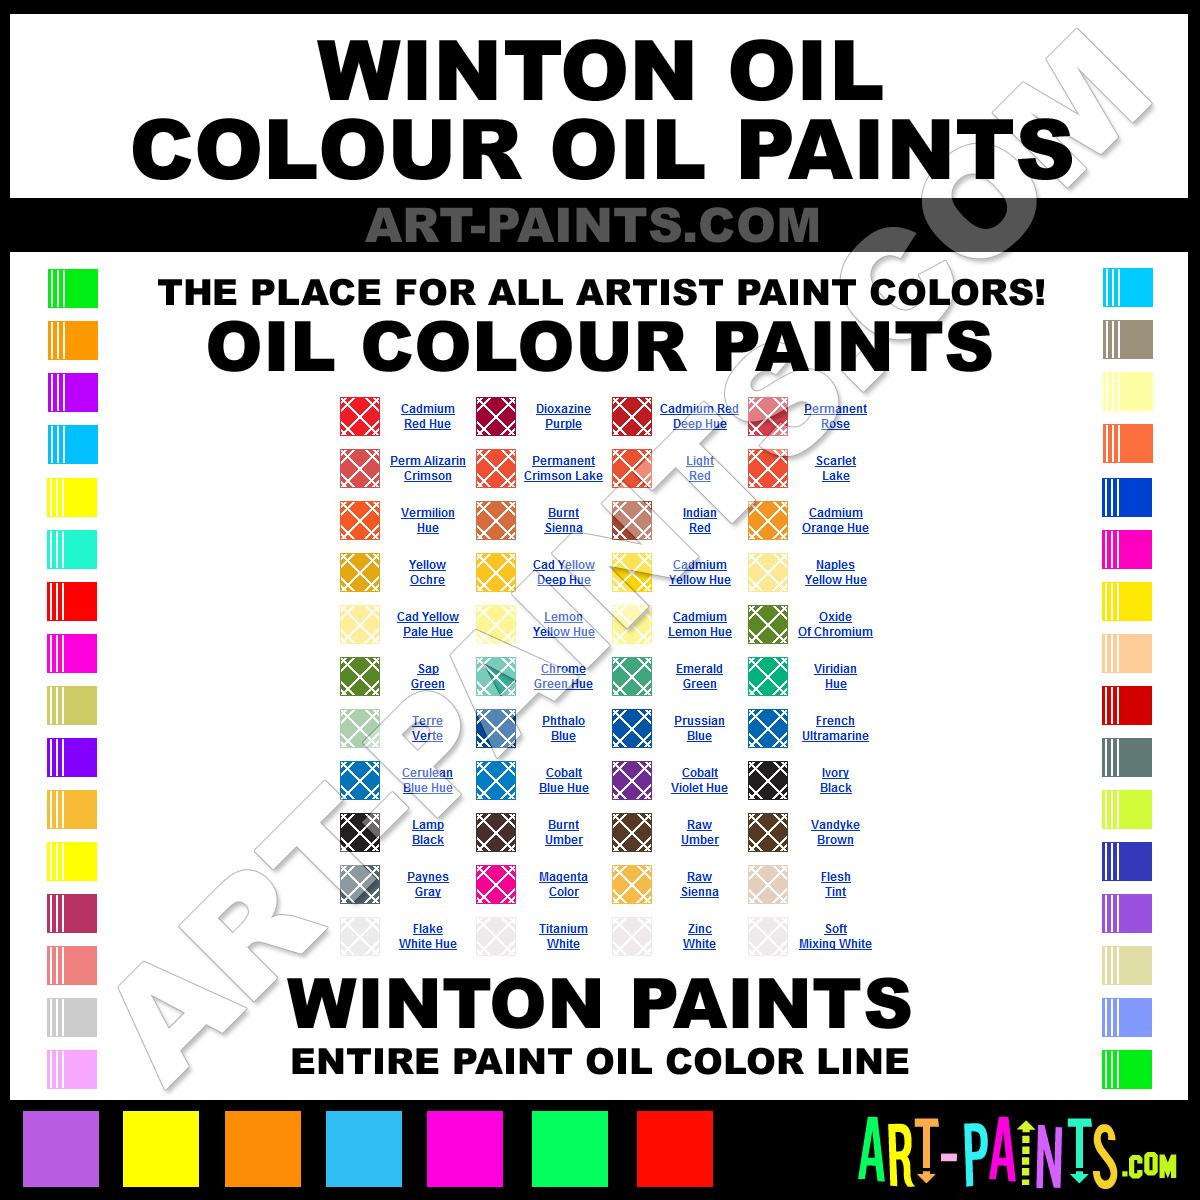 Folk art color chart acrylic paint - Please Note That The Art